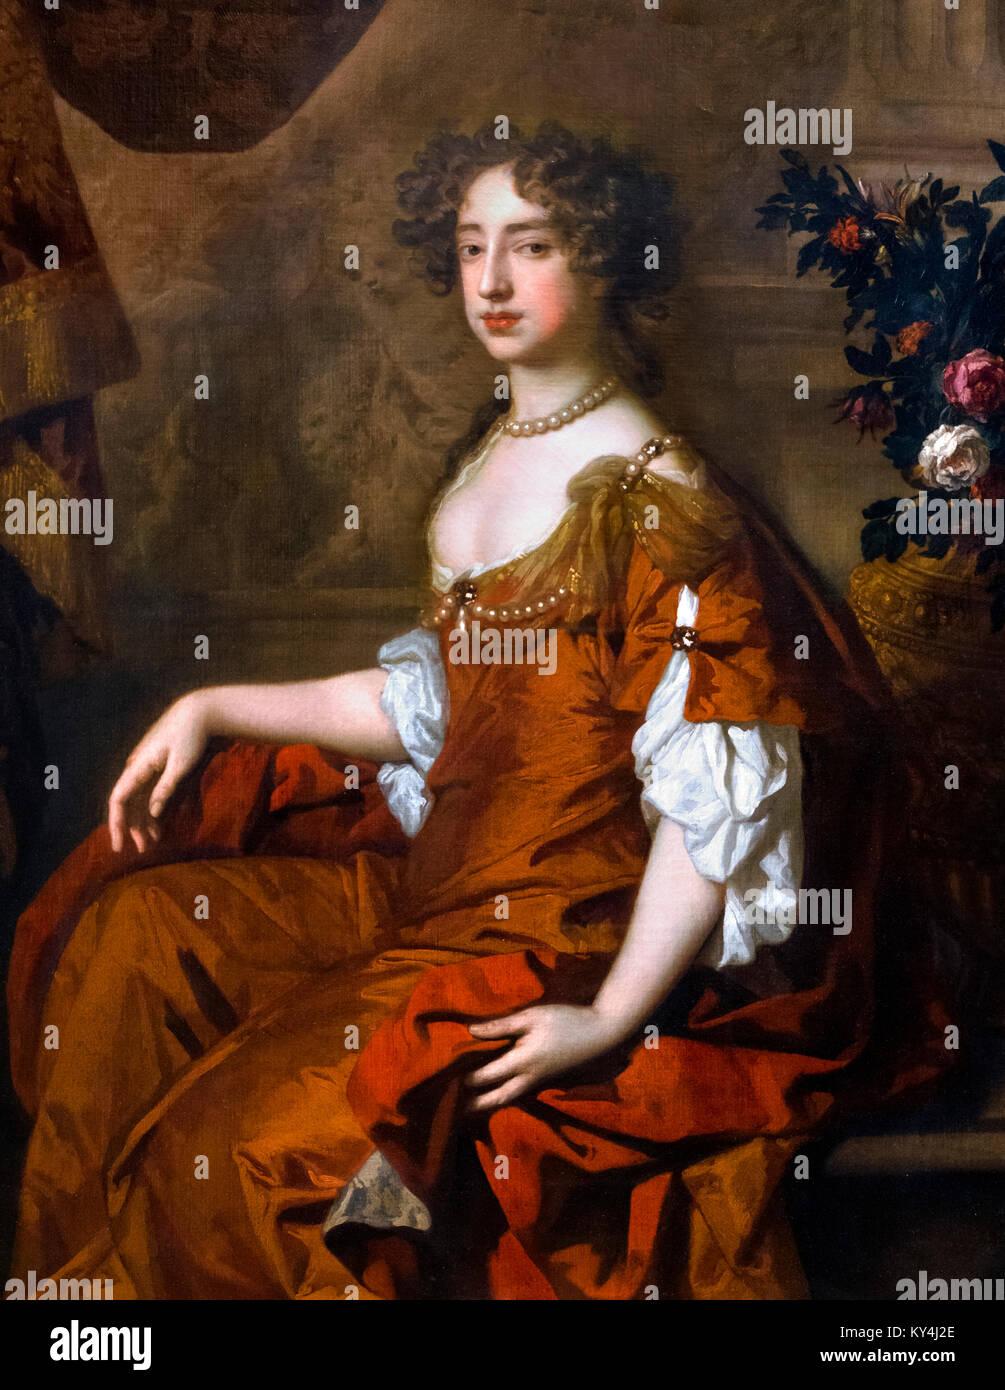 María II (1662-1694). Queen Mary II de Inglaterra por Sir Peter Lely, óleo sobre lienzo, 1677 Imagen De Stock